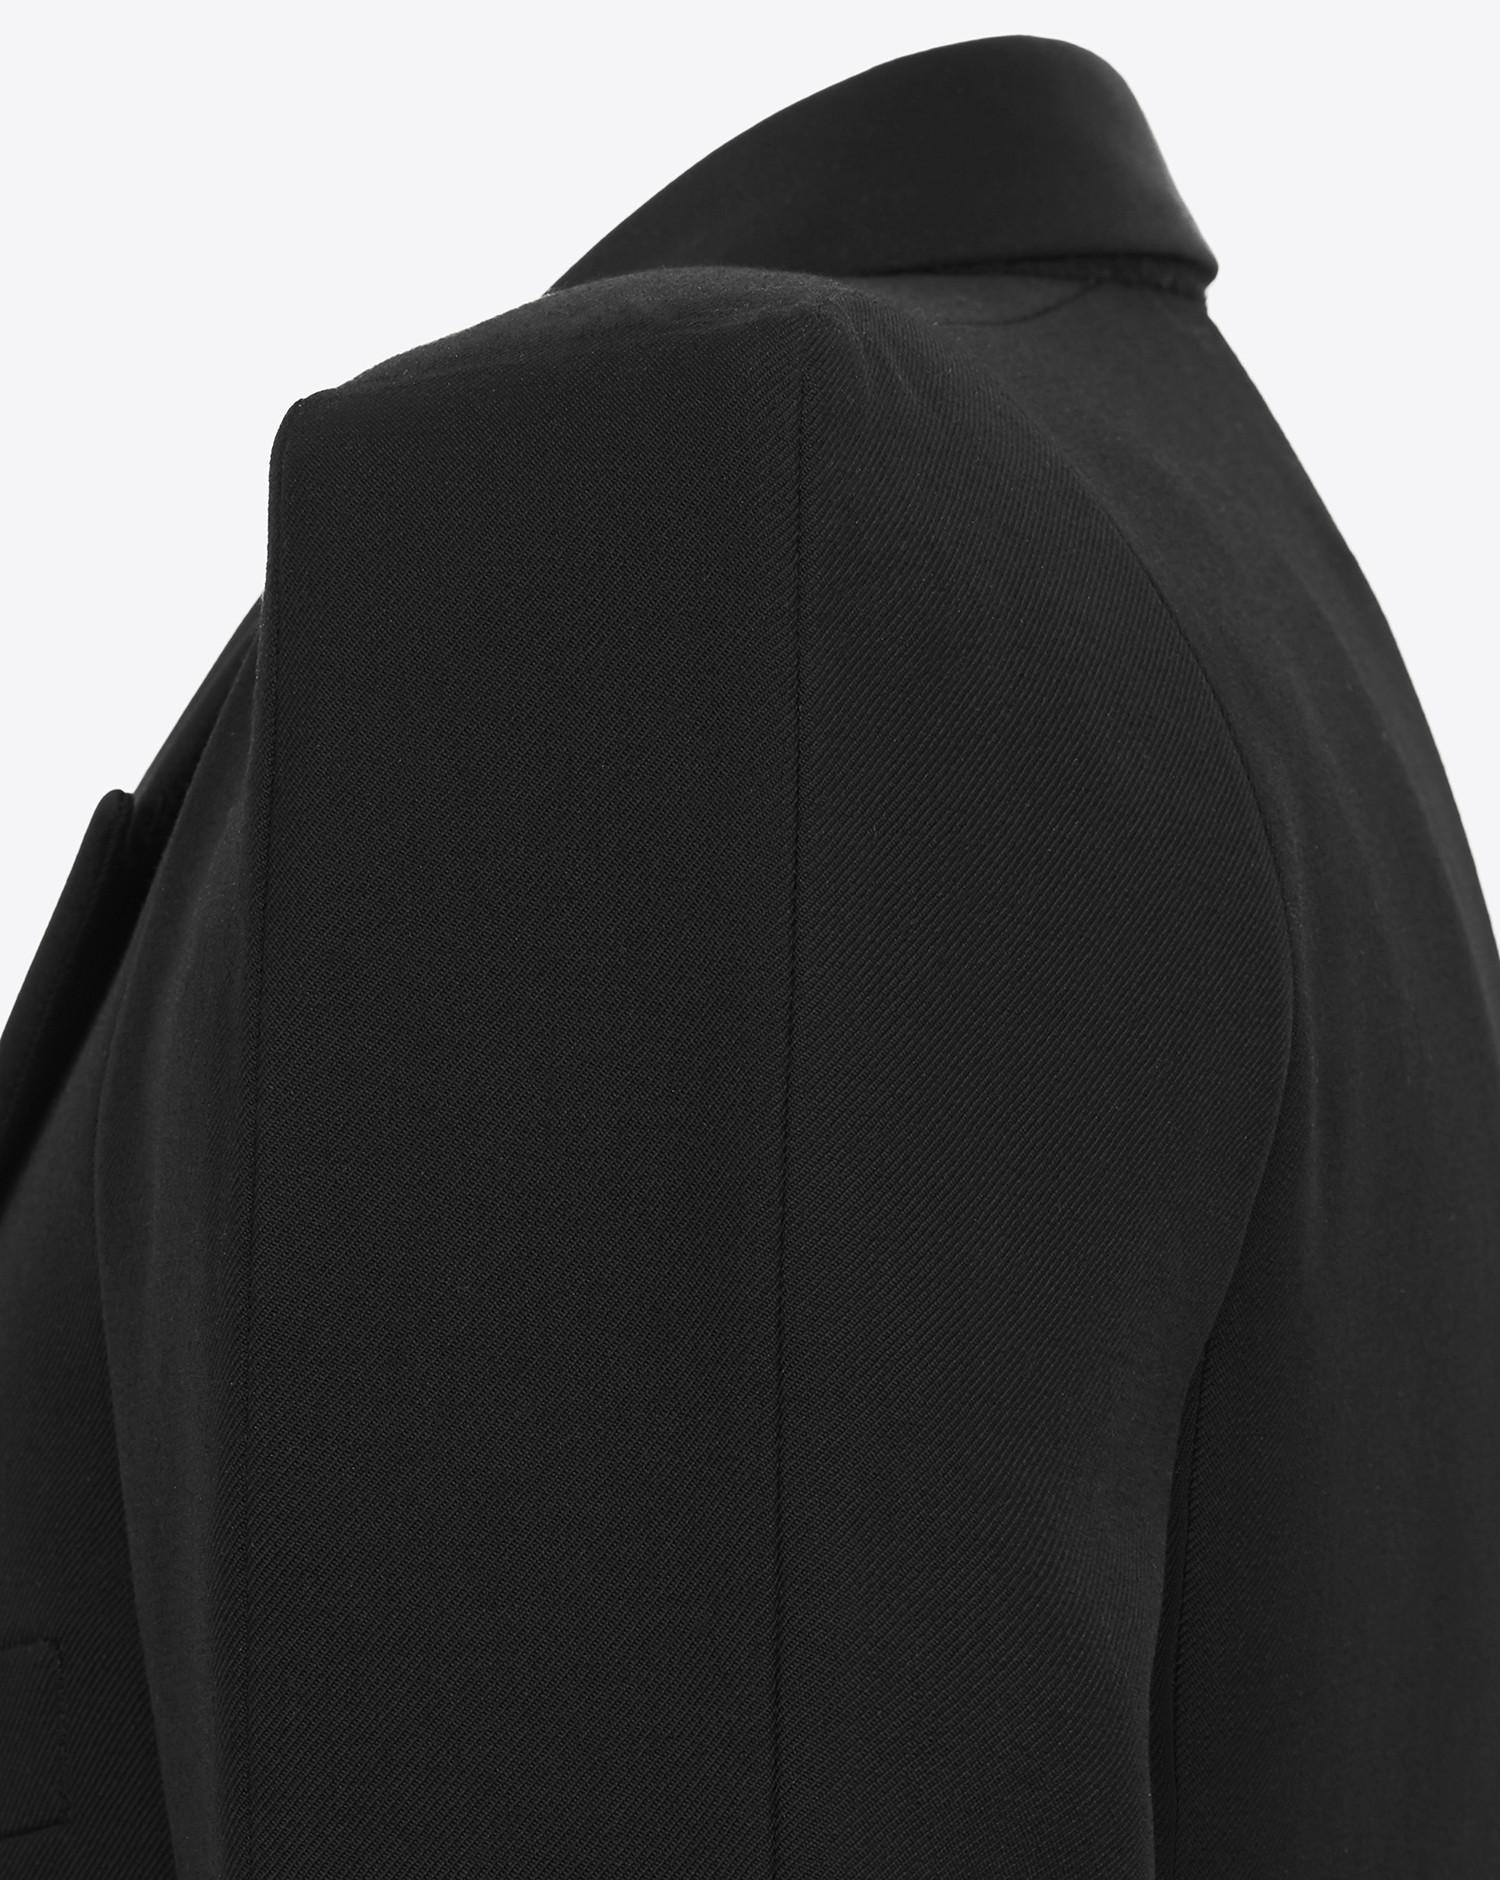 b0abbab3ec Men's Tux Jacket With Square-cut Shoulders In Black Gabardine